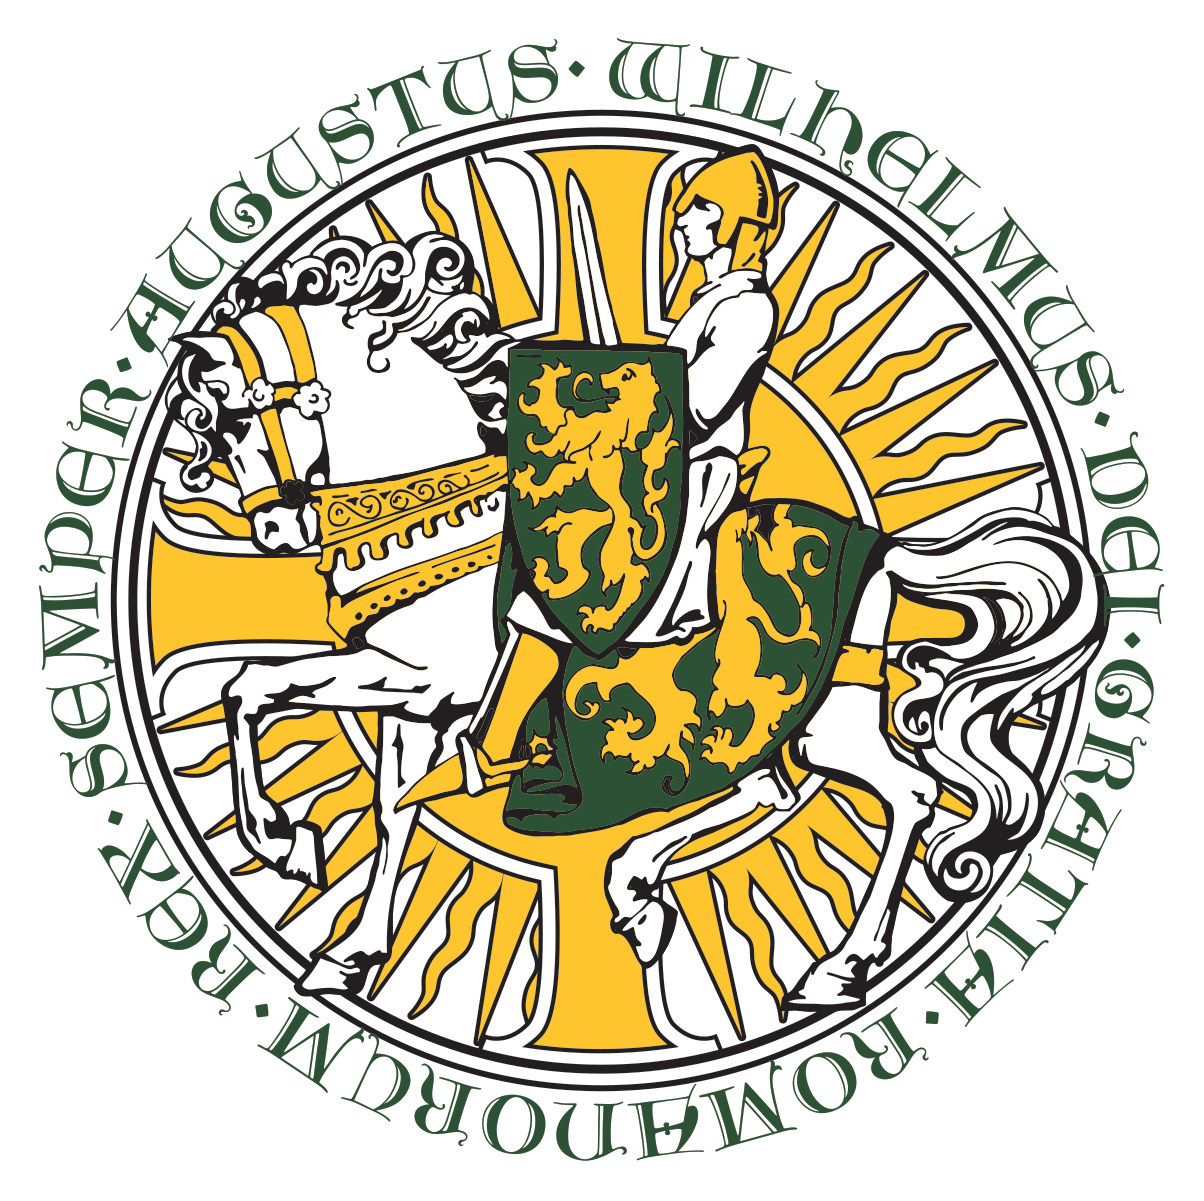 graaf-willem-logo